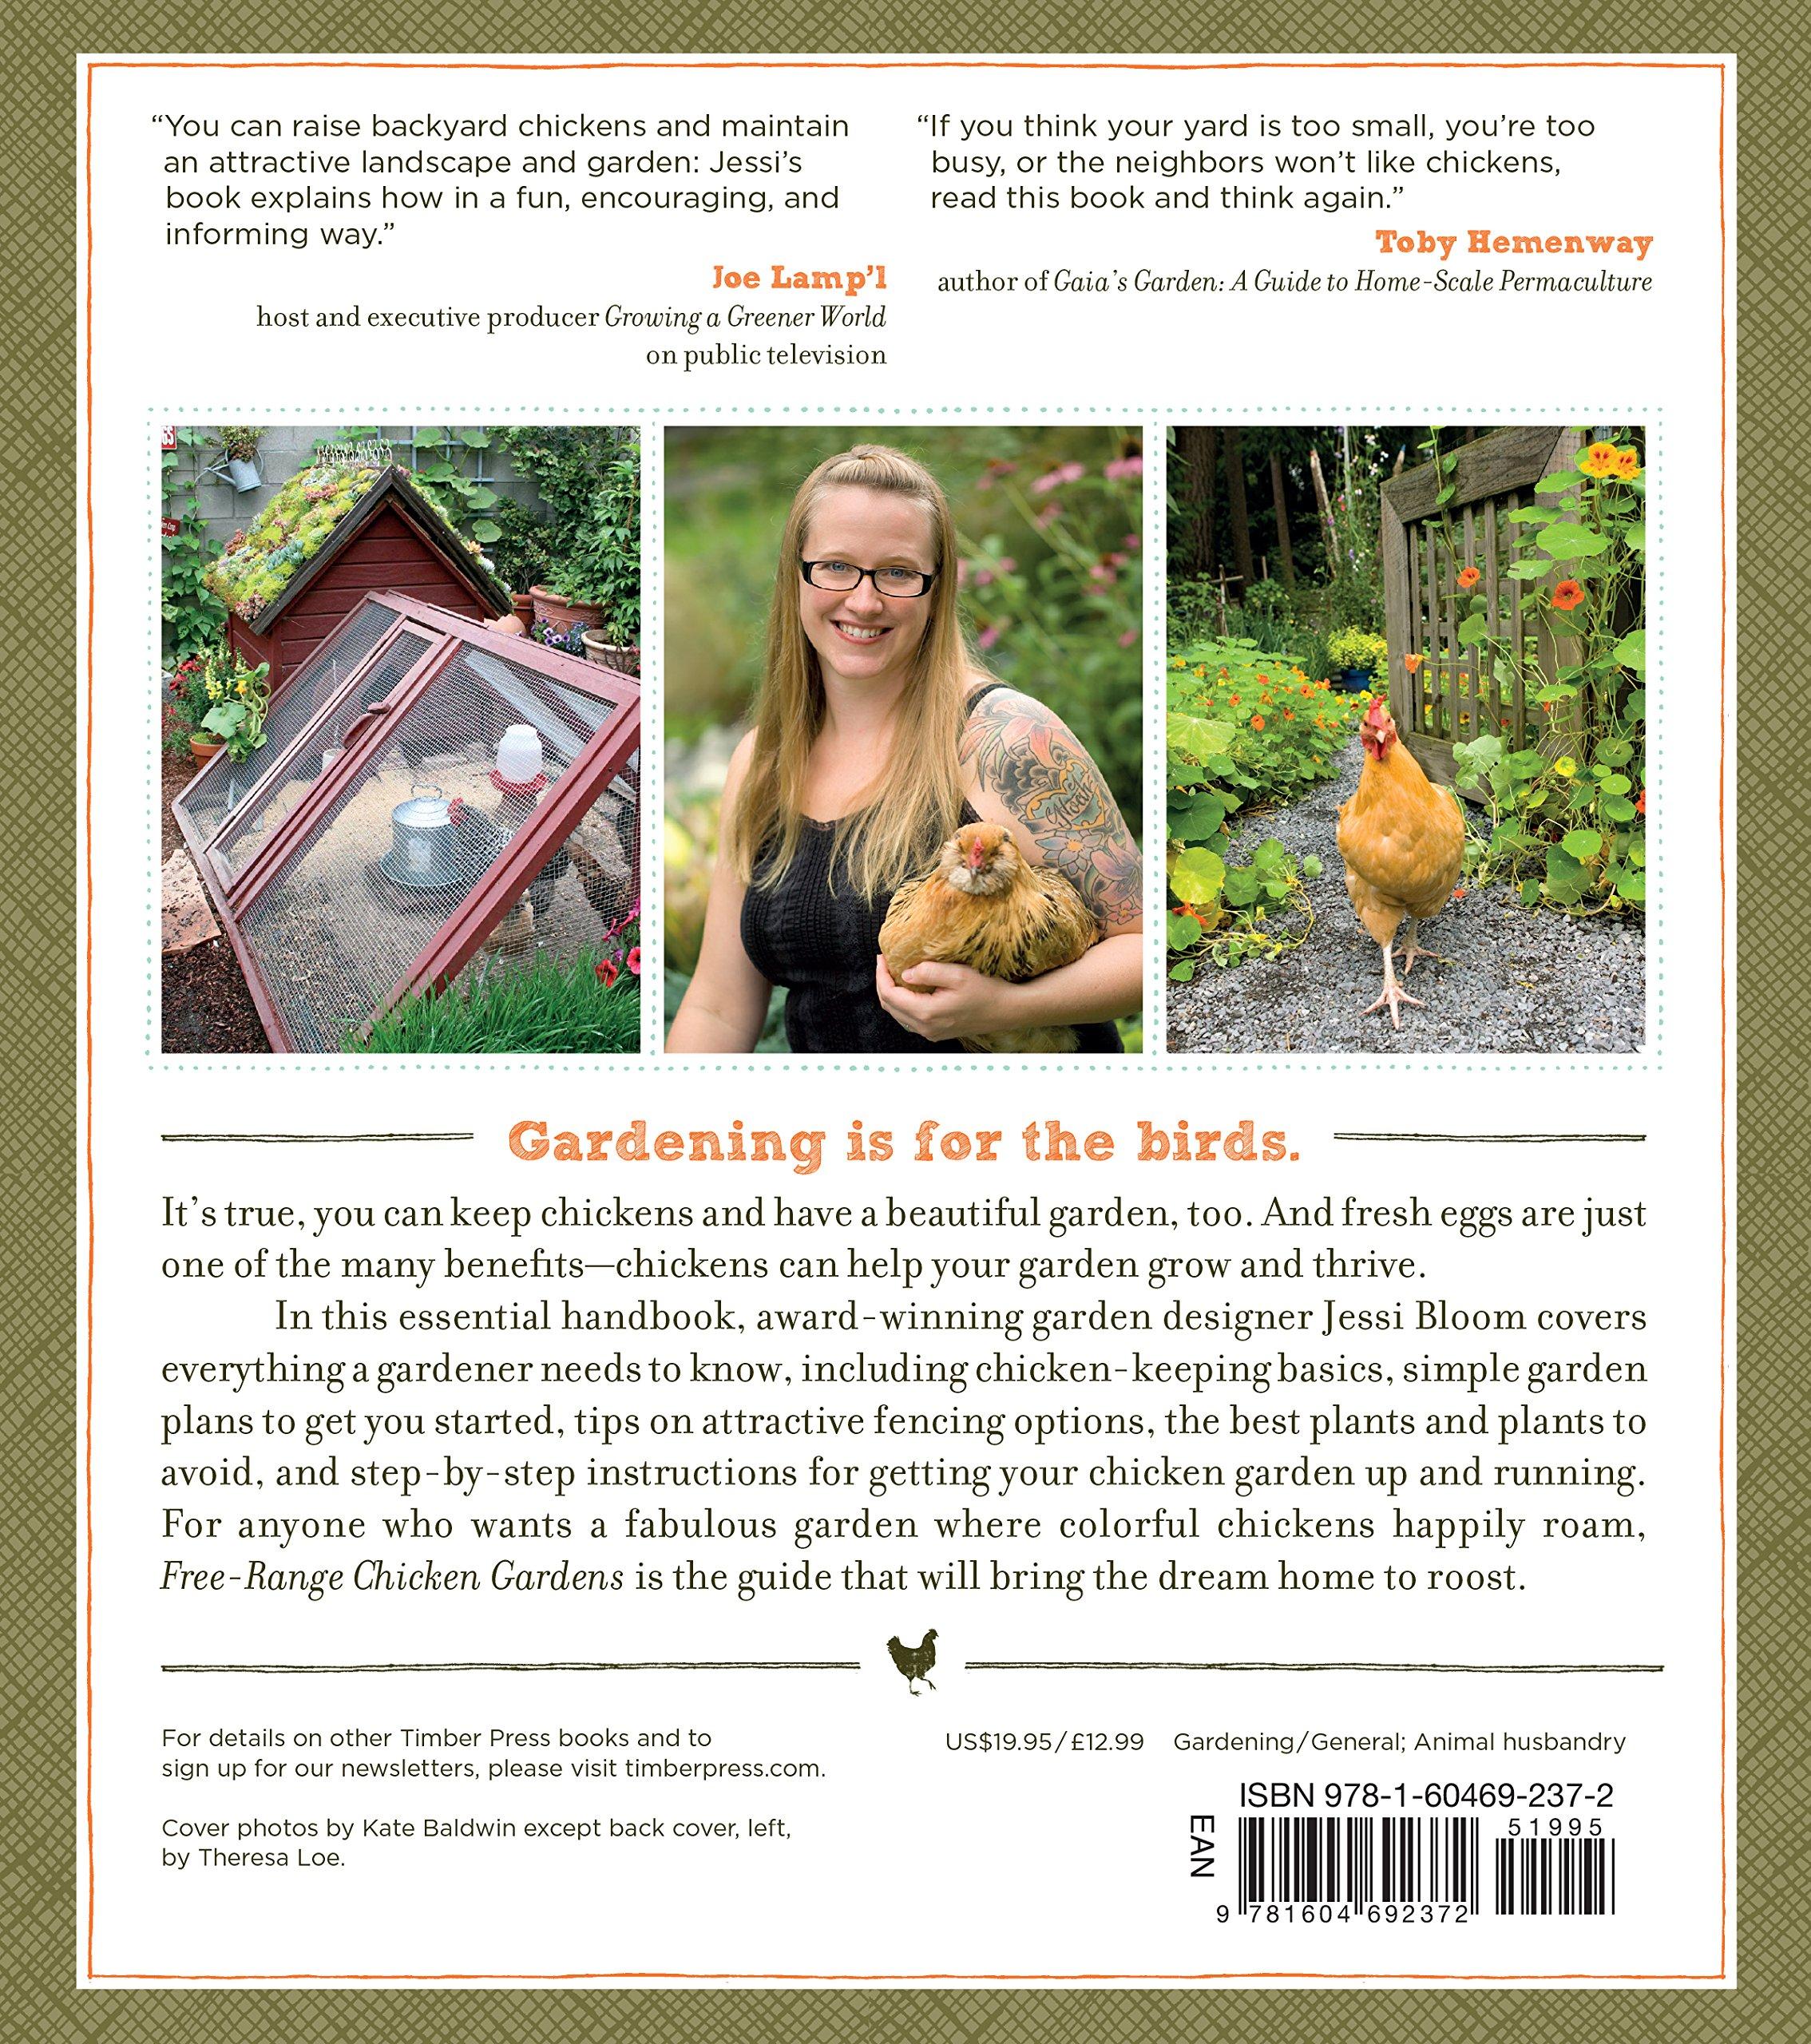 free range chicken gardens how to create a beautiful chicken